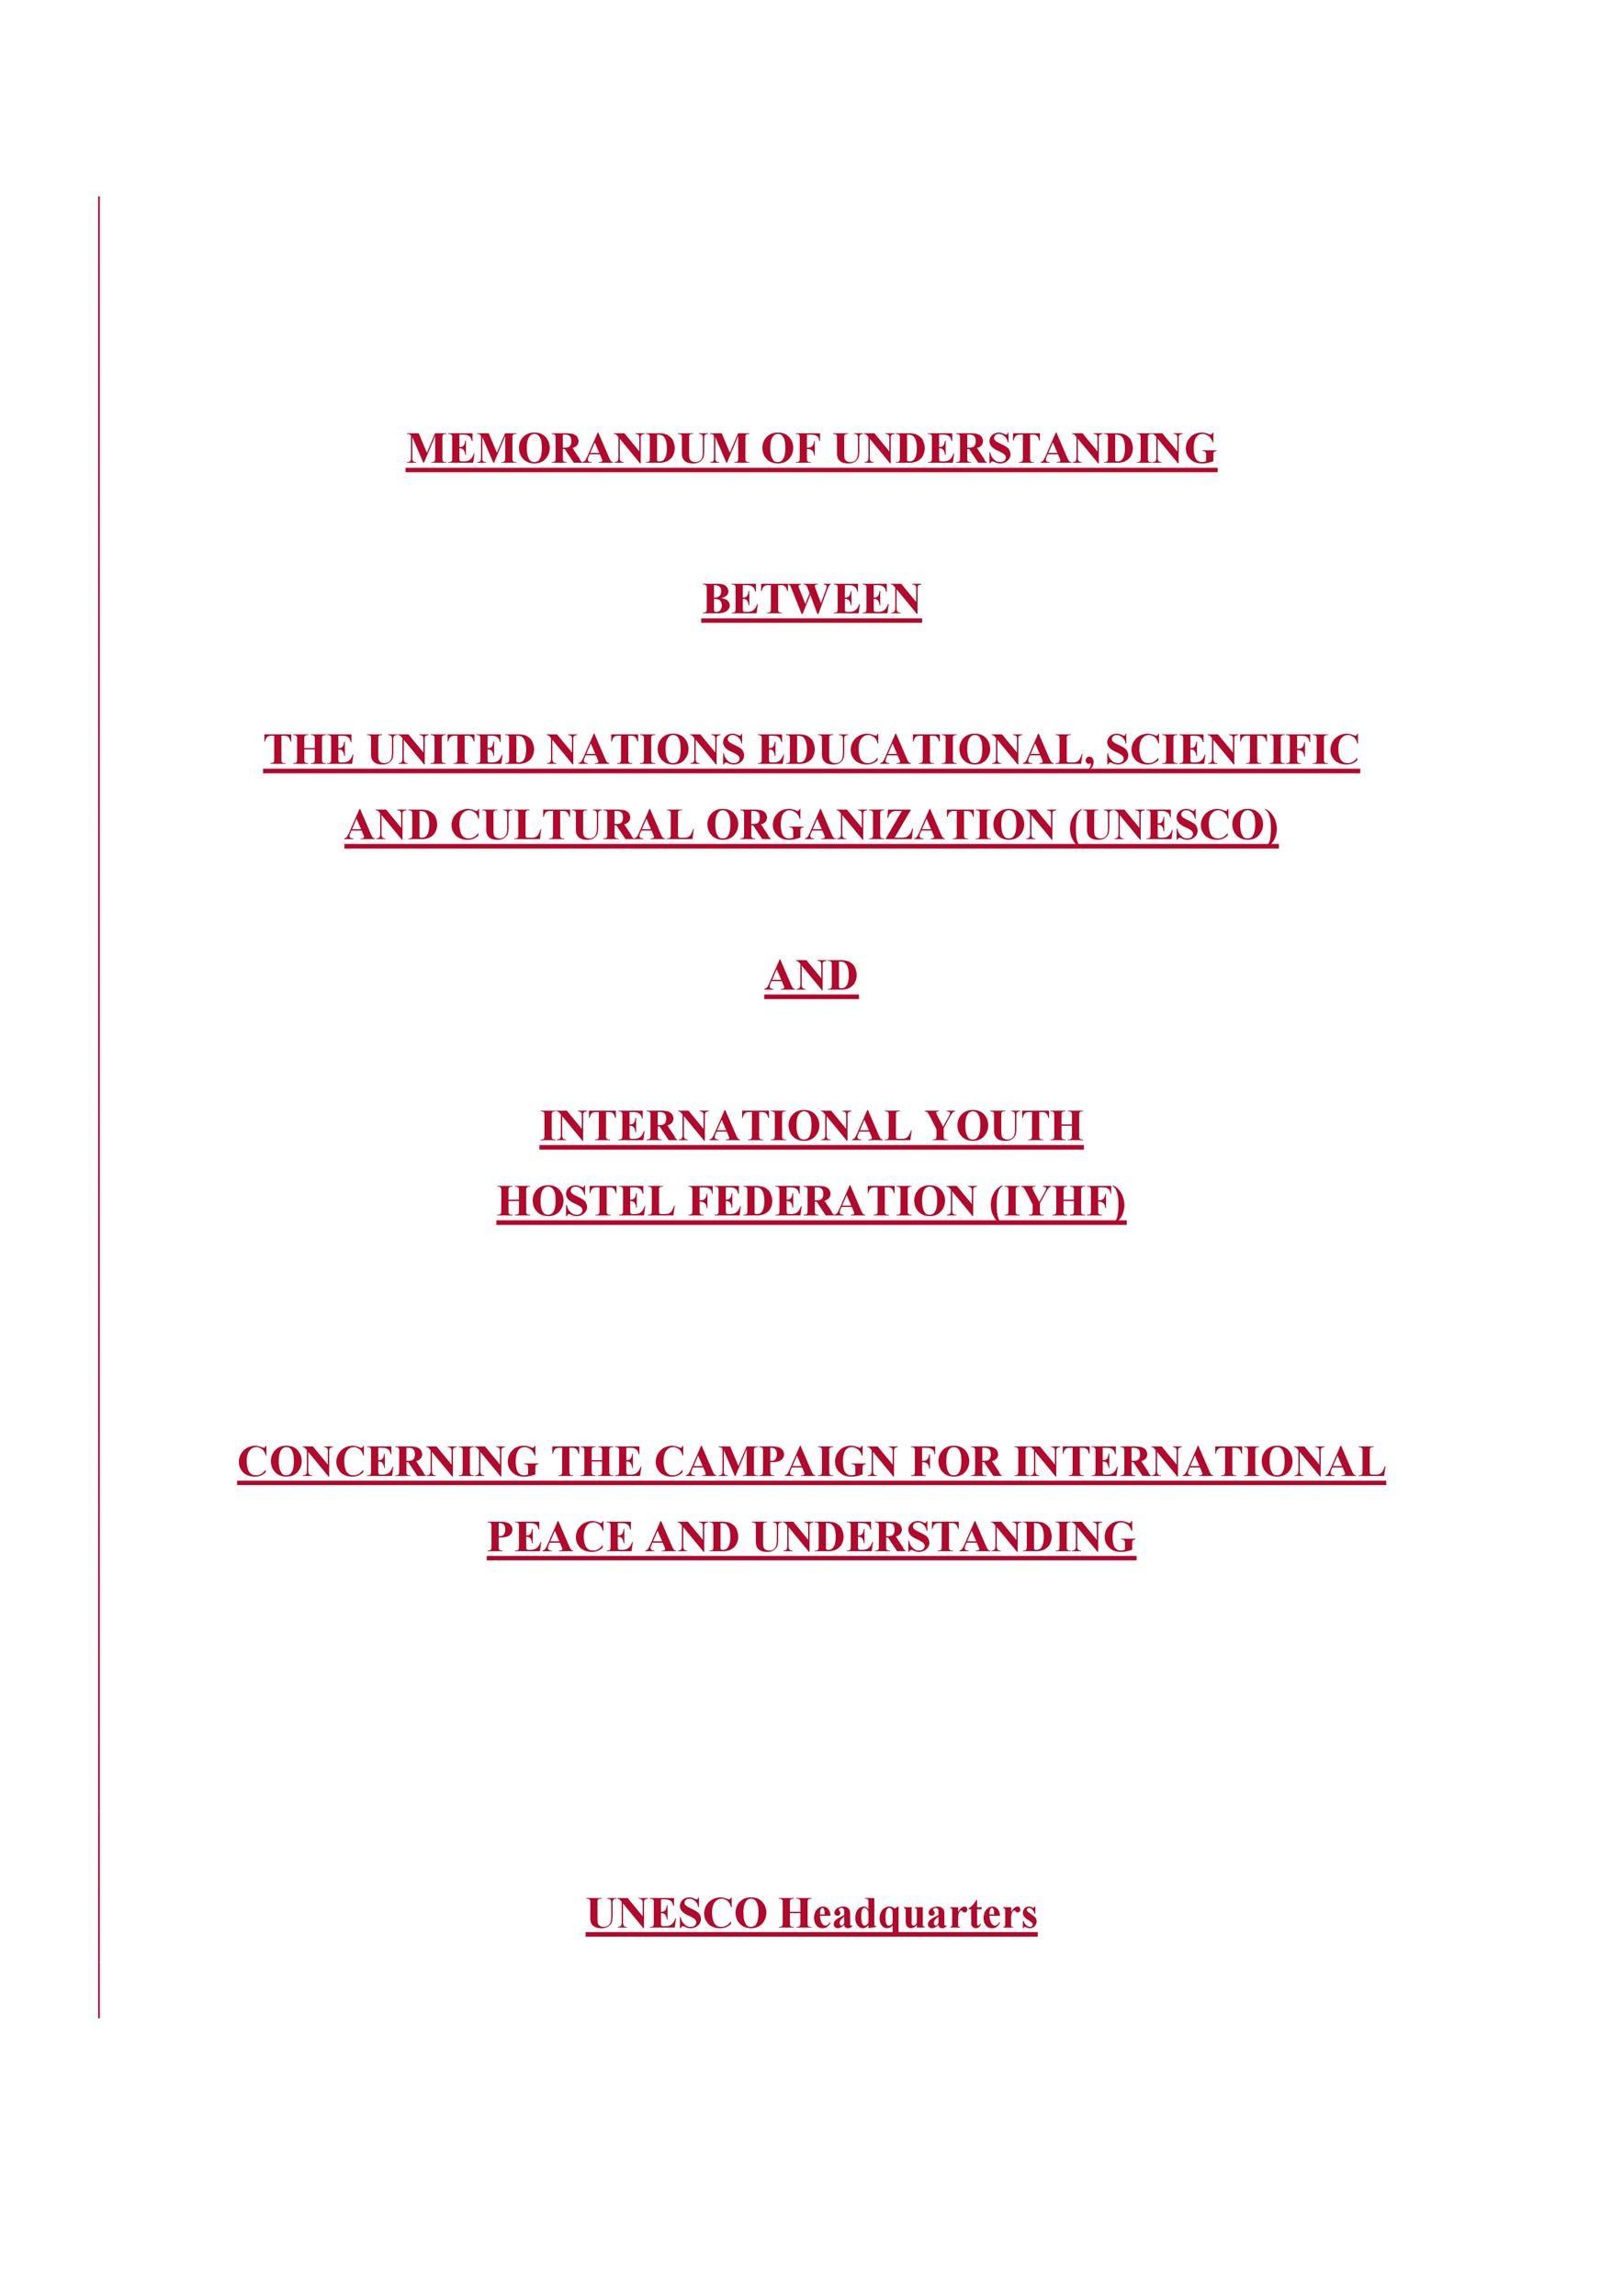 Free Memorandum of Understanding Template 50